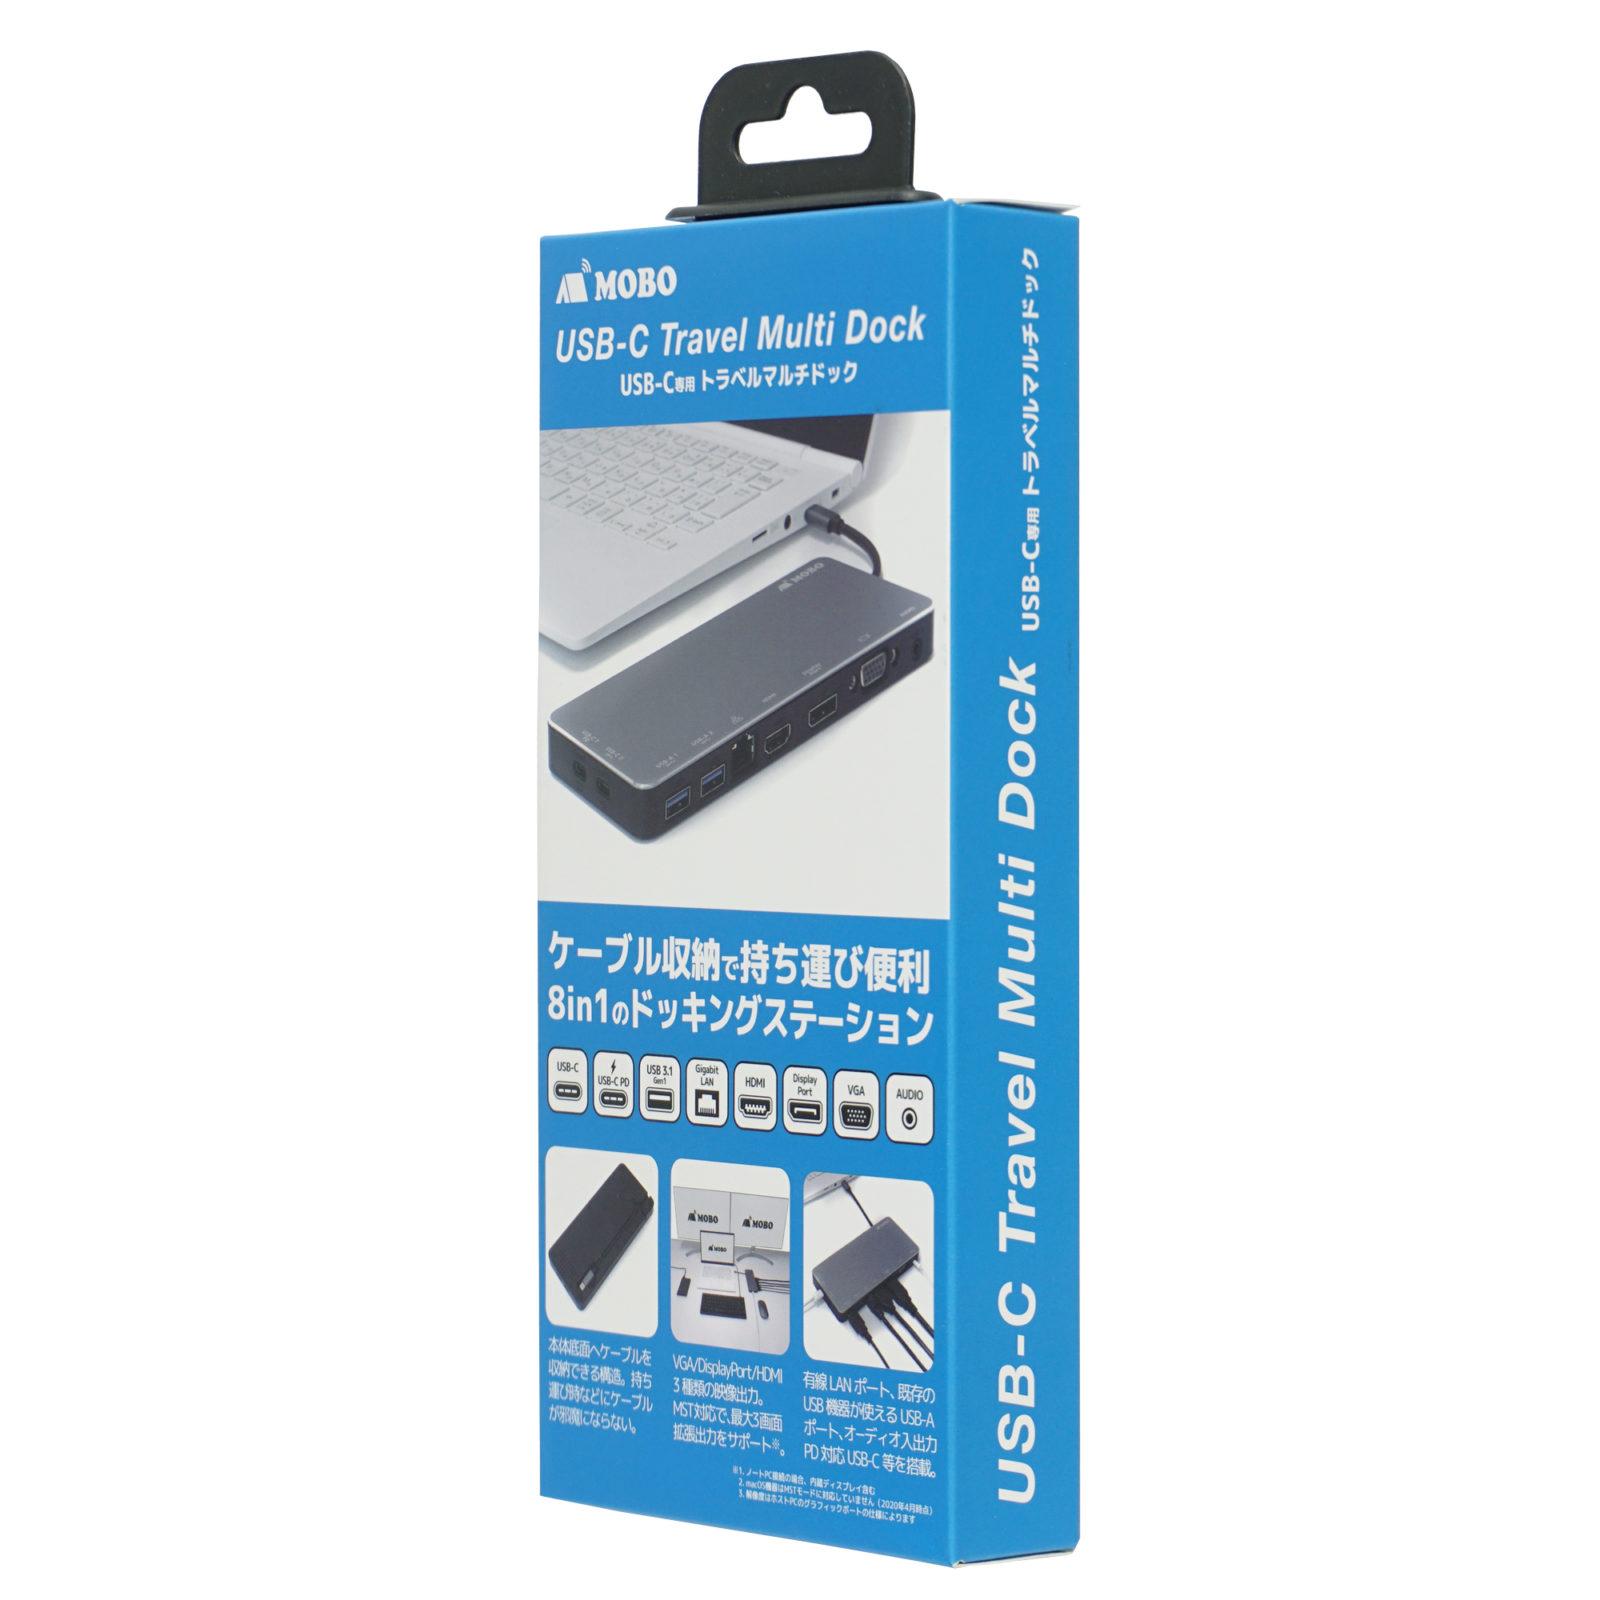 USB-C-Travel-Multi-Dock-34